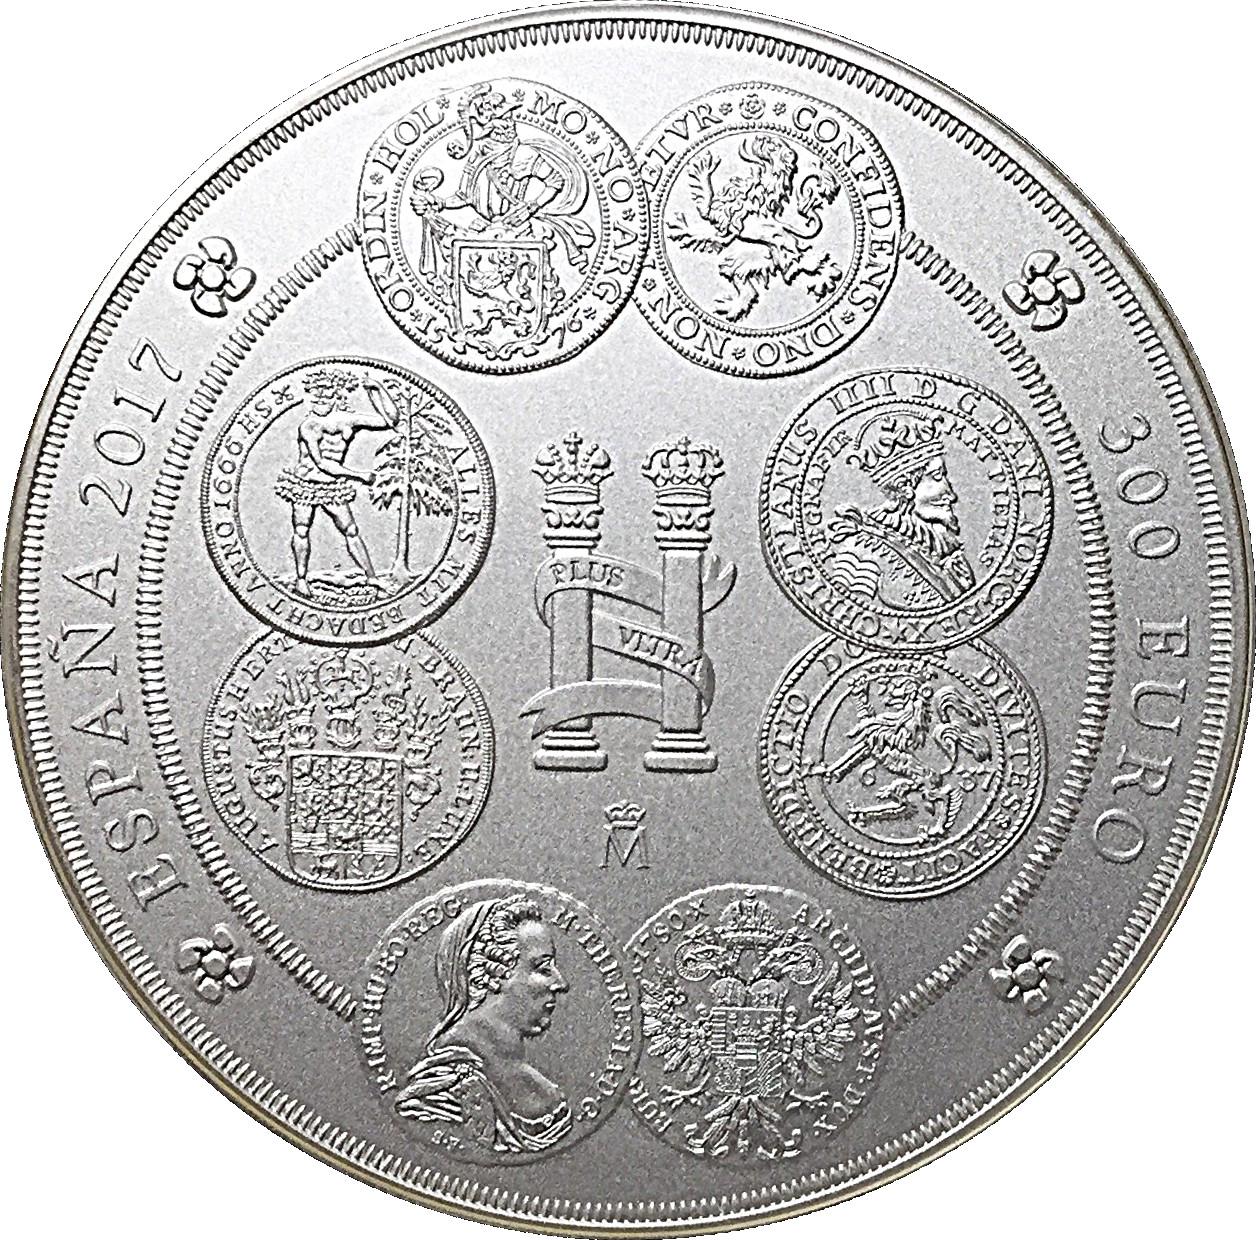 300 Euro Felipe Vi History Of The